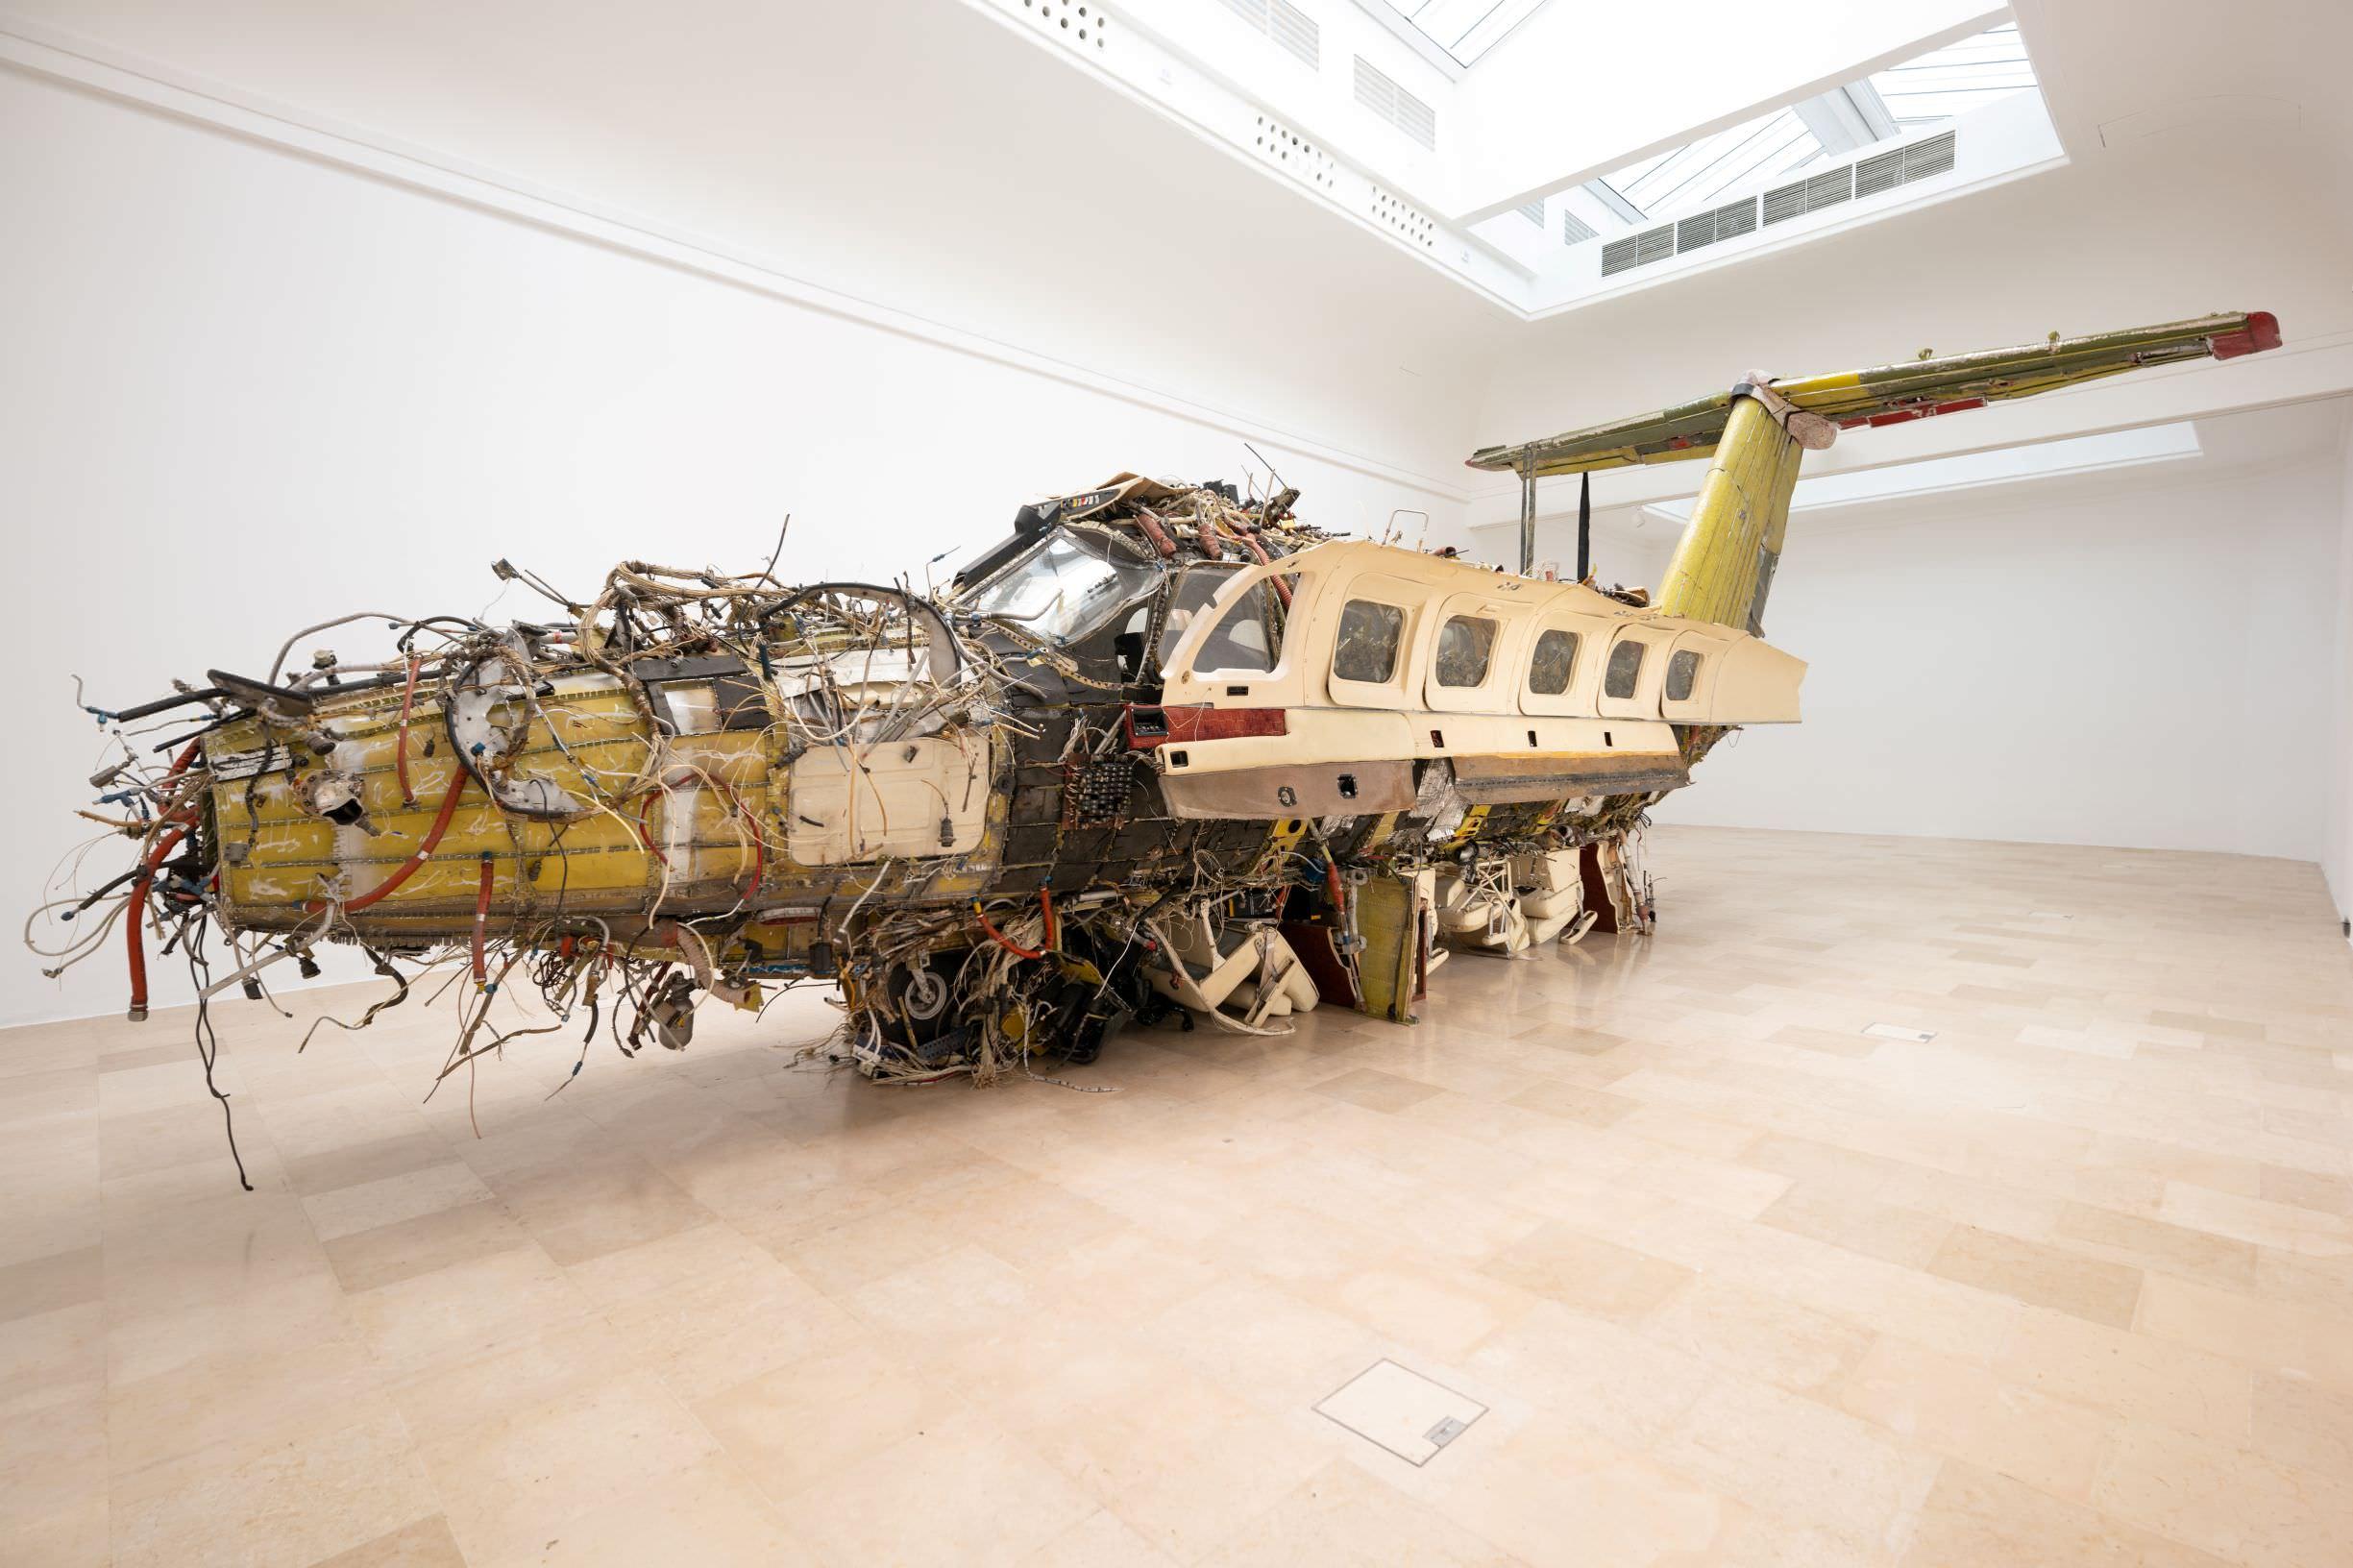 Flight, sculpture by Roman Stańczak at the Polish Pavilion, exhibition documentation, 2019, photo: Zachęta – National Gallery of Art/Weronika Wysocka.